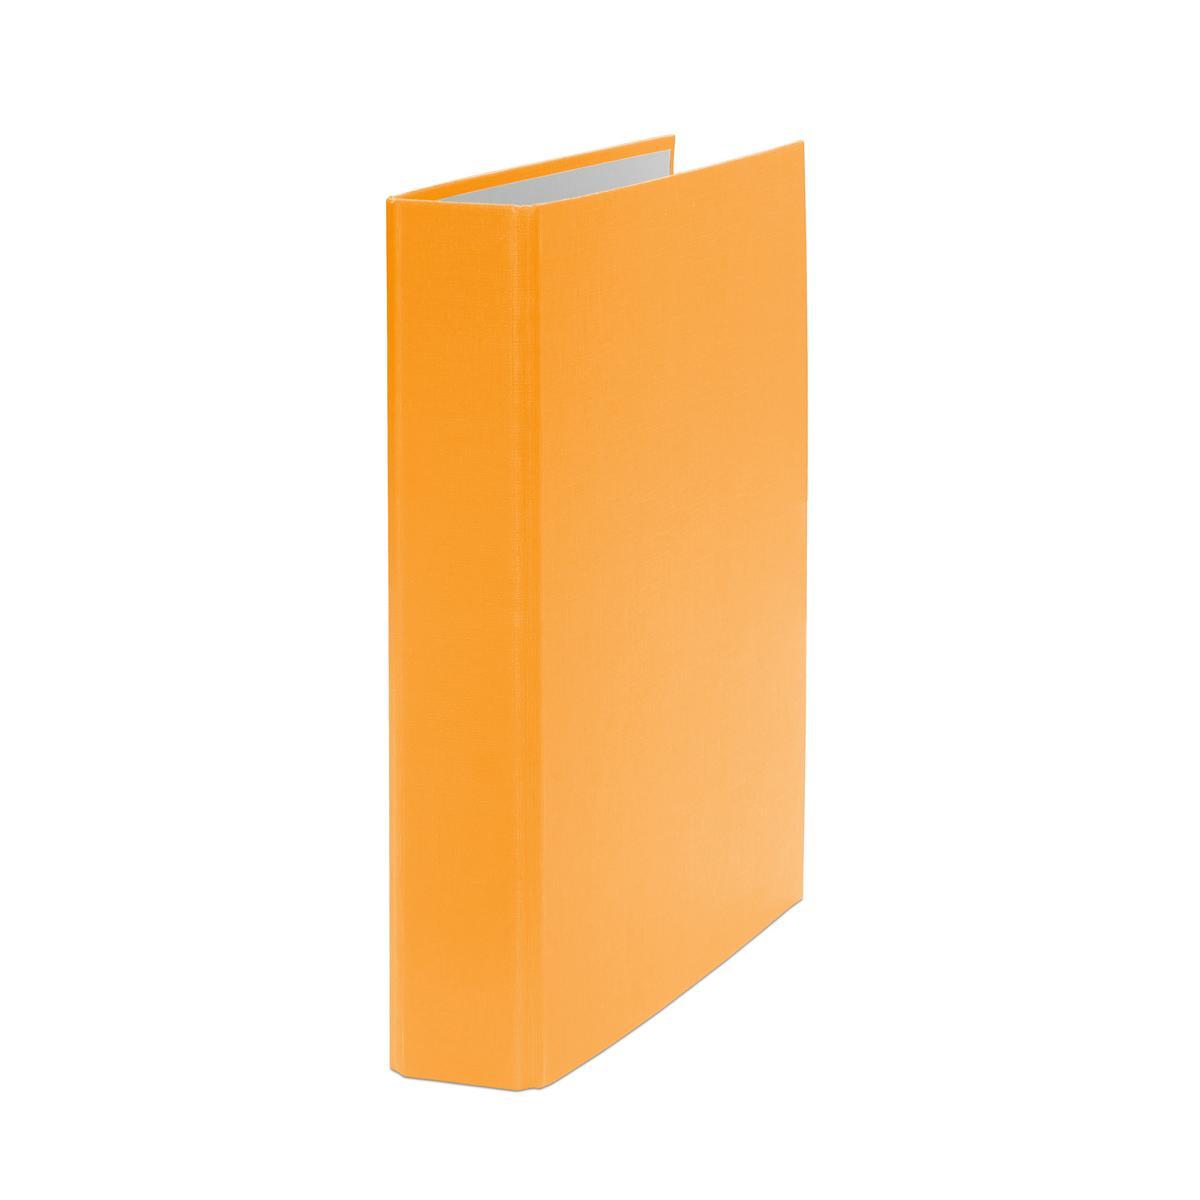 Farbe orange 10 Prospekthüllen Ringbuch DIN A5 2-Ring Ordner